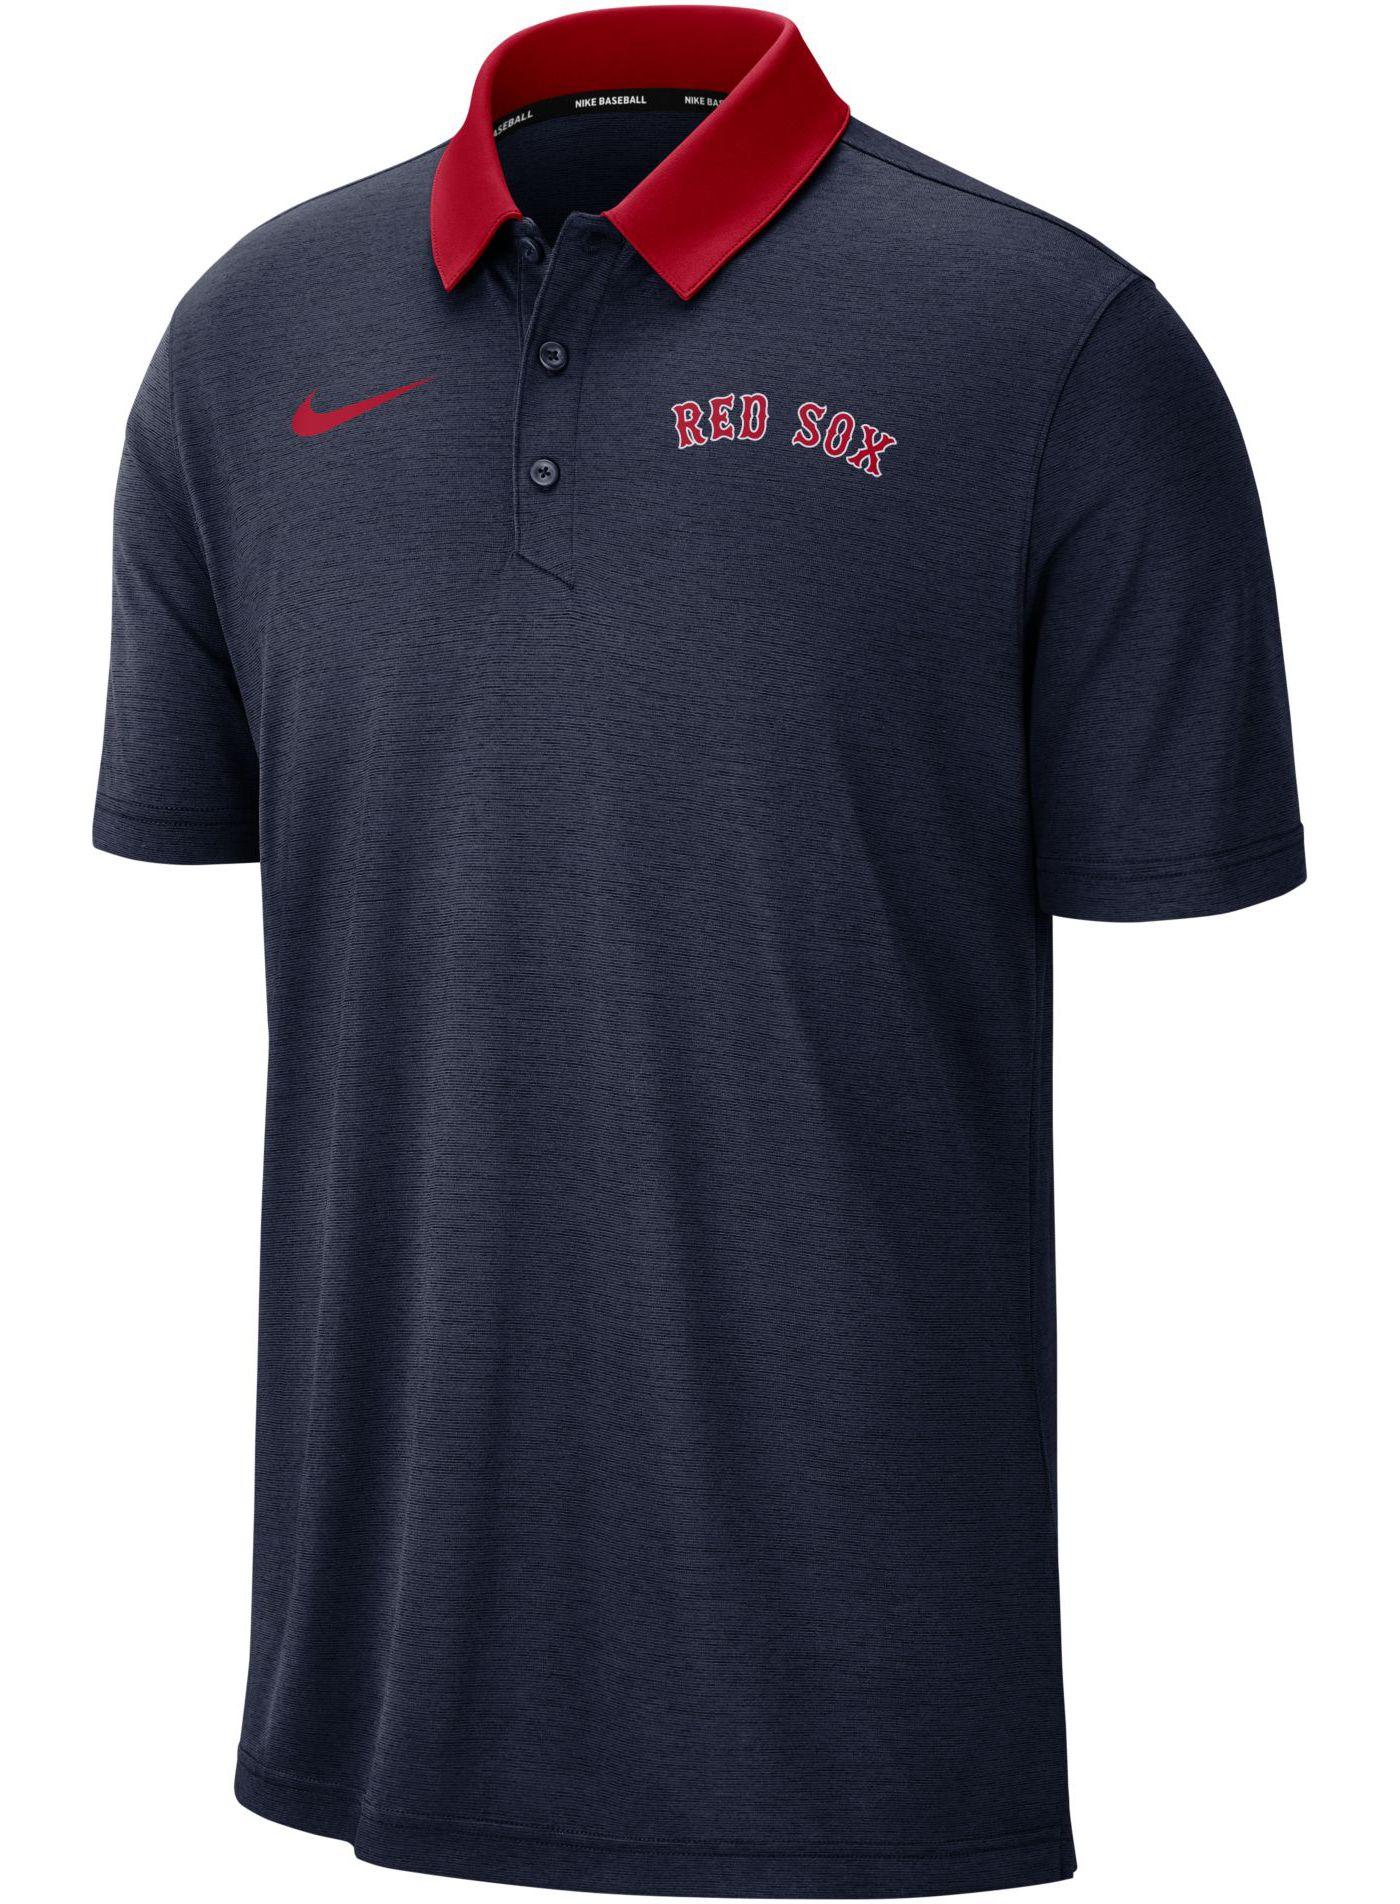 Nike Men's Boston Red Sox Breathe Polo